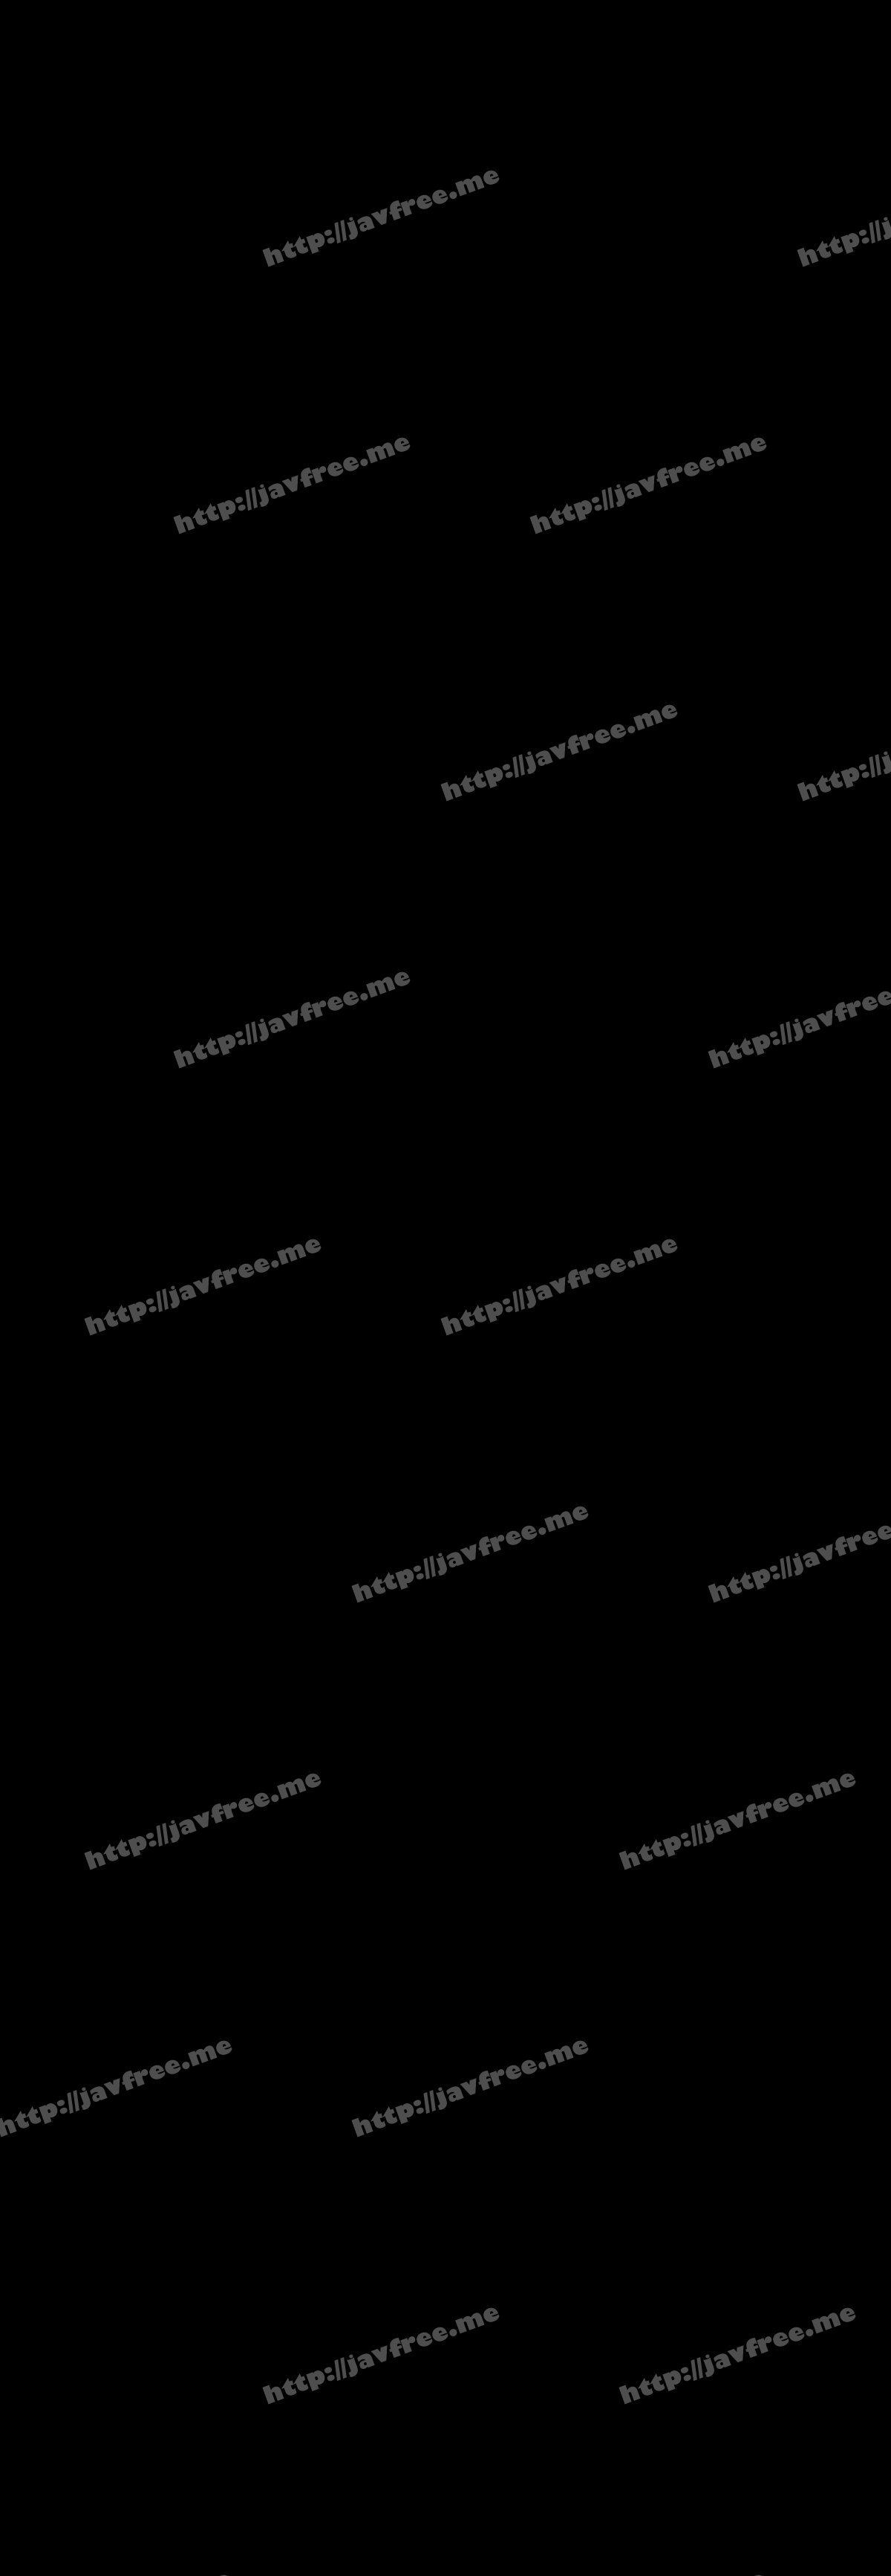 [HD][WANZ-862] 男潮吹きそのまま挿入、スプラッシュ中出し! 椎名そら - image WANZ-862-720p on https://javfree.me